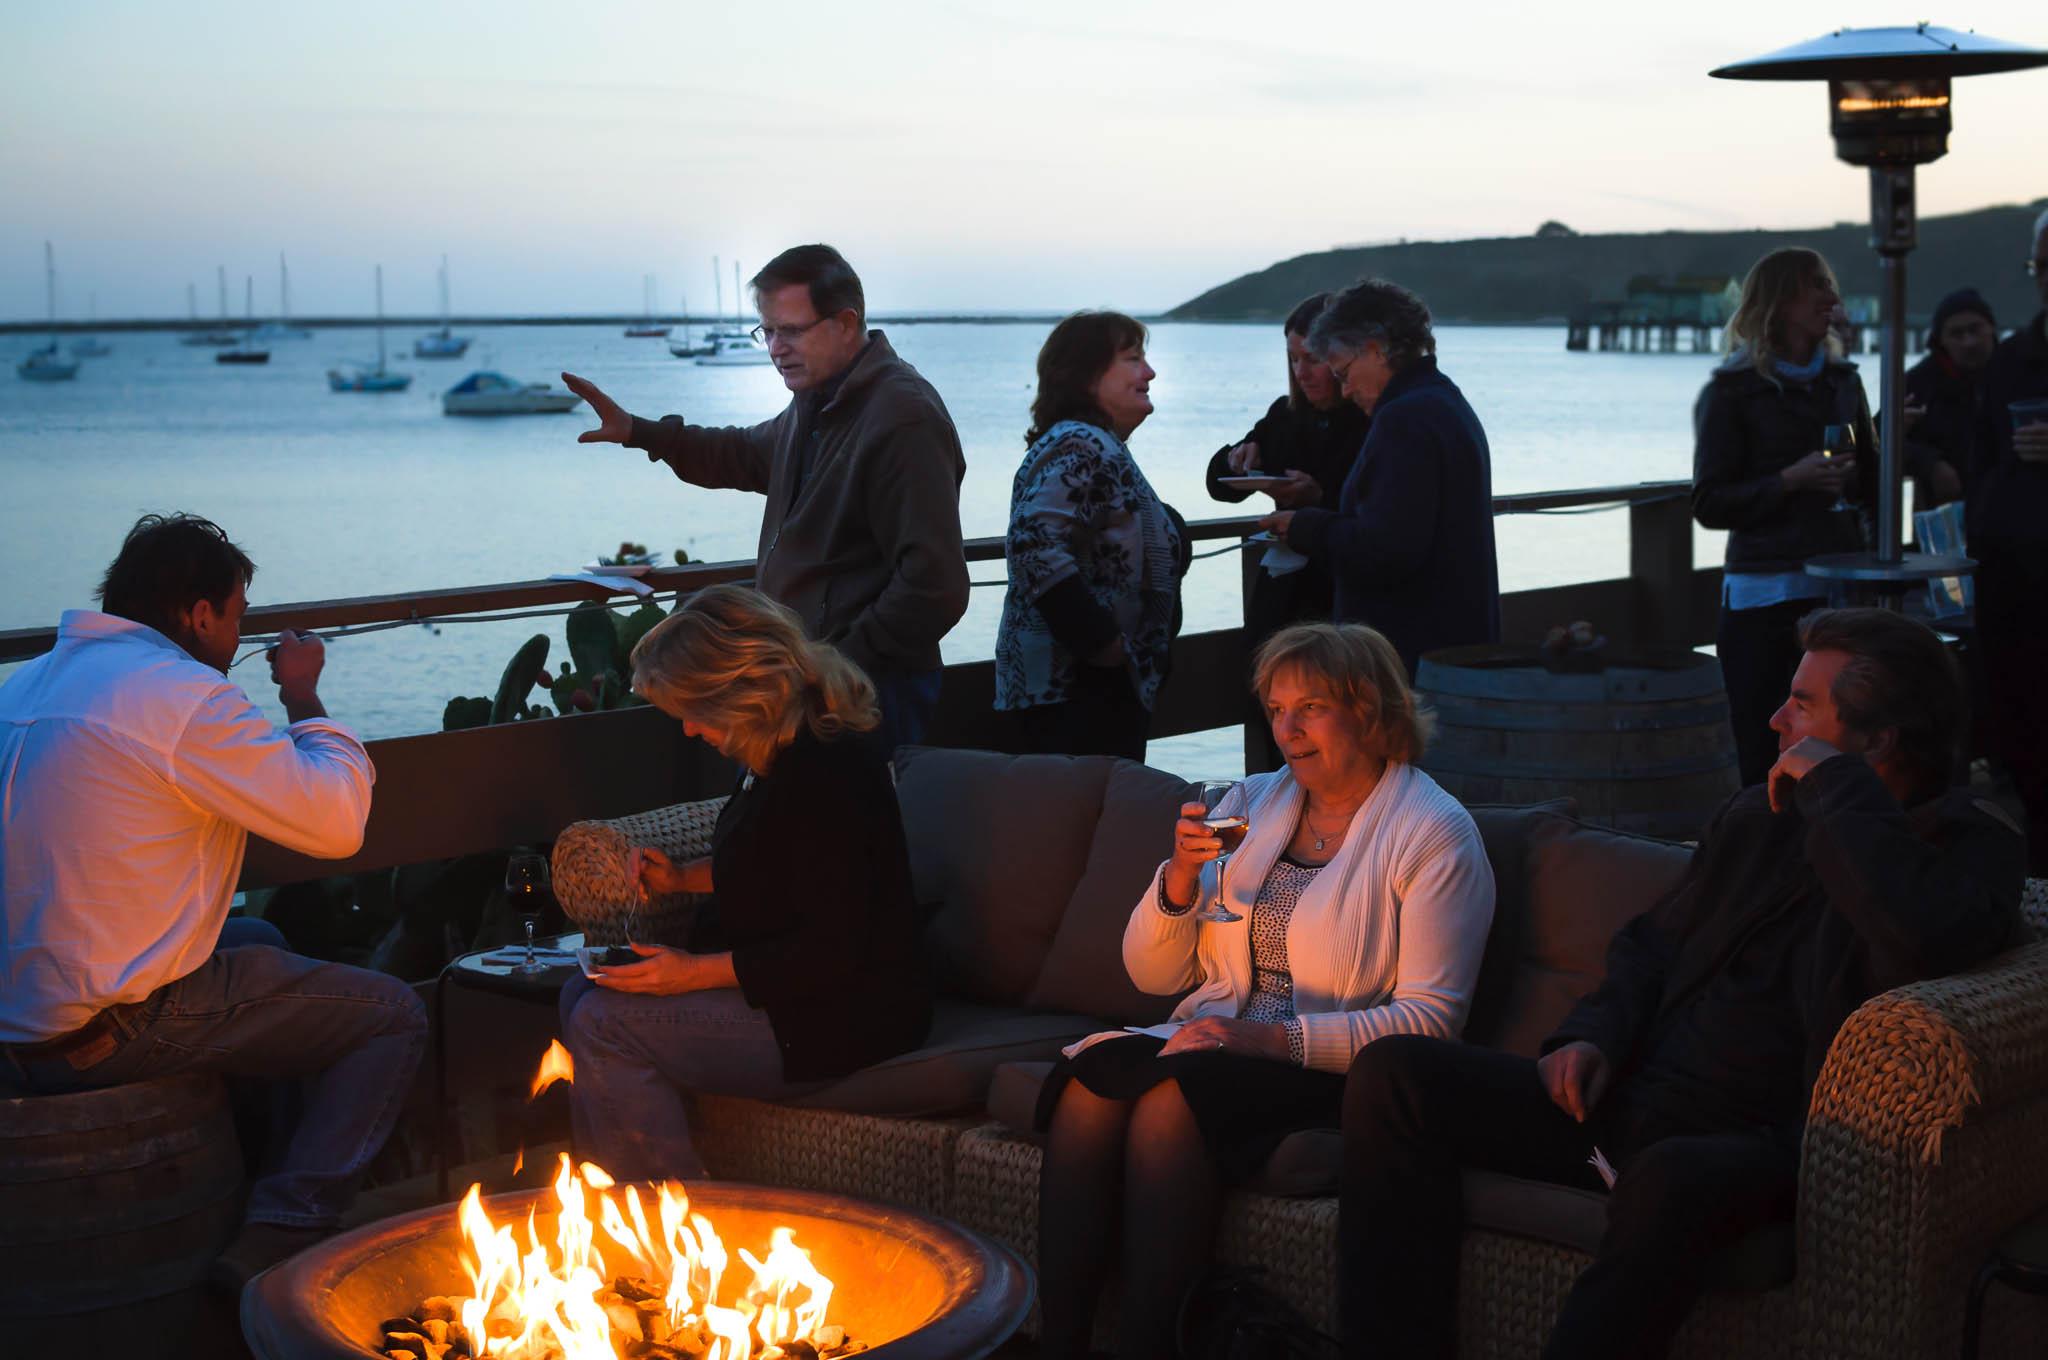 Maverick''s Event Center is tucked away inside Pillar Point Harbor in El Granada. Nice sunset (but cold!)